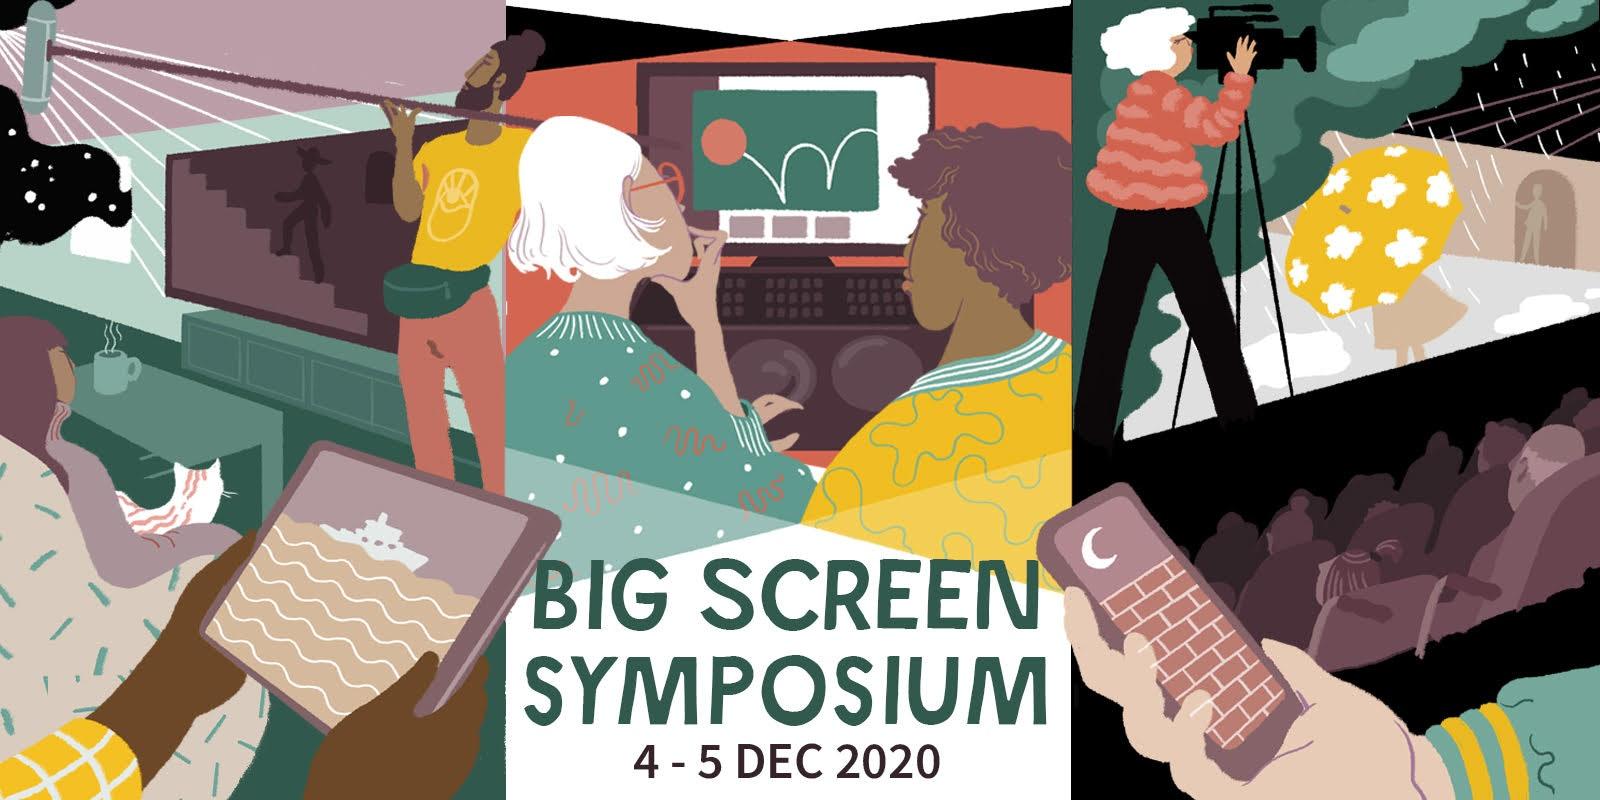 Big Screen Symposium